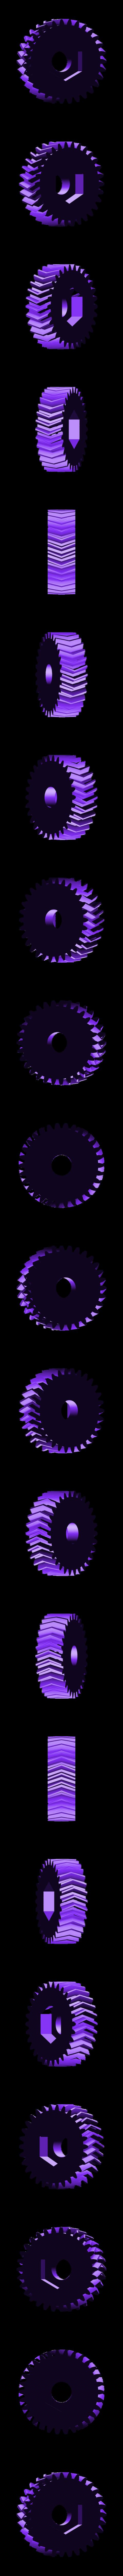 Drive_gear_D.stl Download free STL file Bubbles! • 3D printer object, Zippityboomba